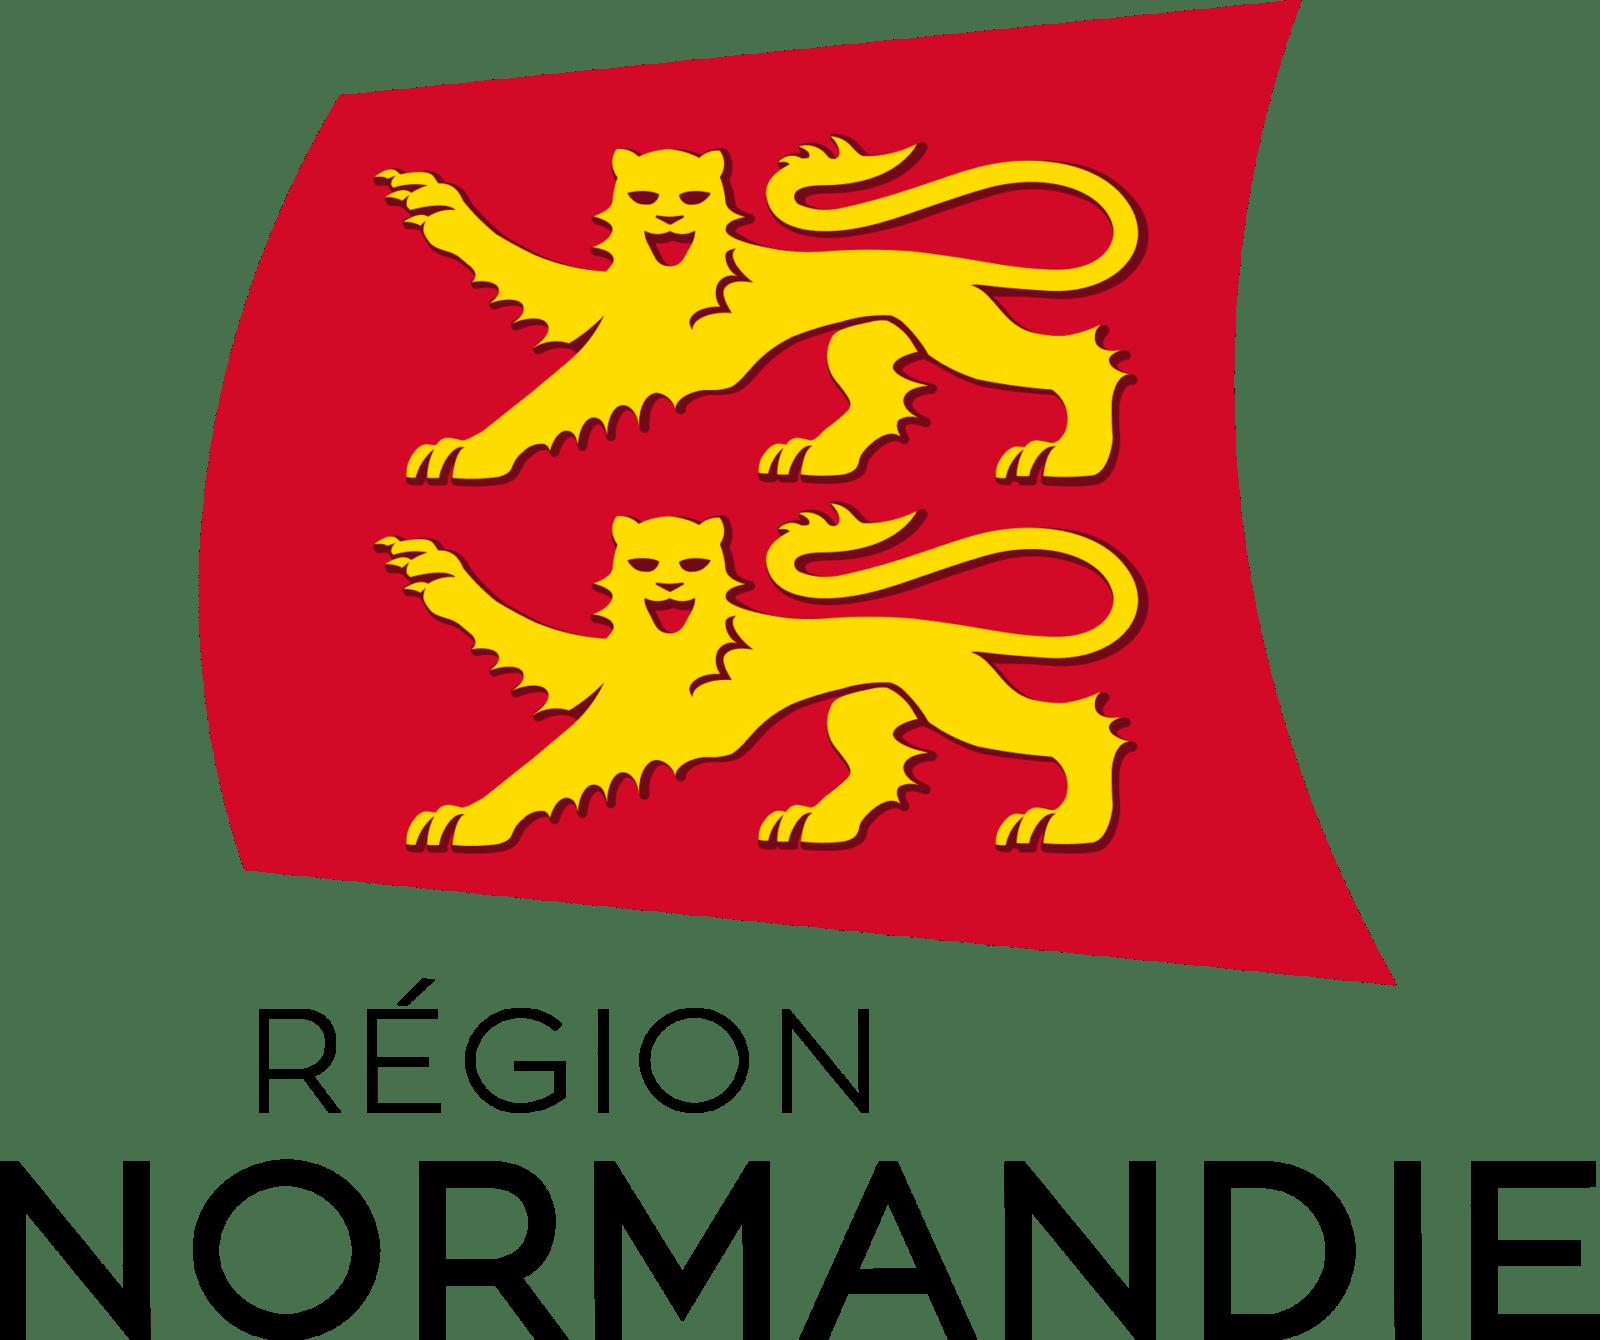 Région Normandie - Made in normandie - Fabriqué en normandie